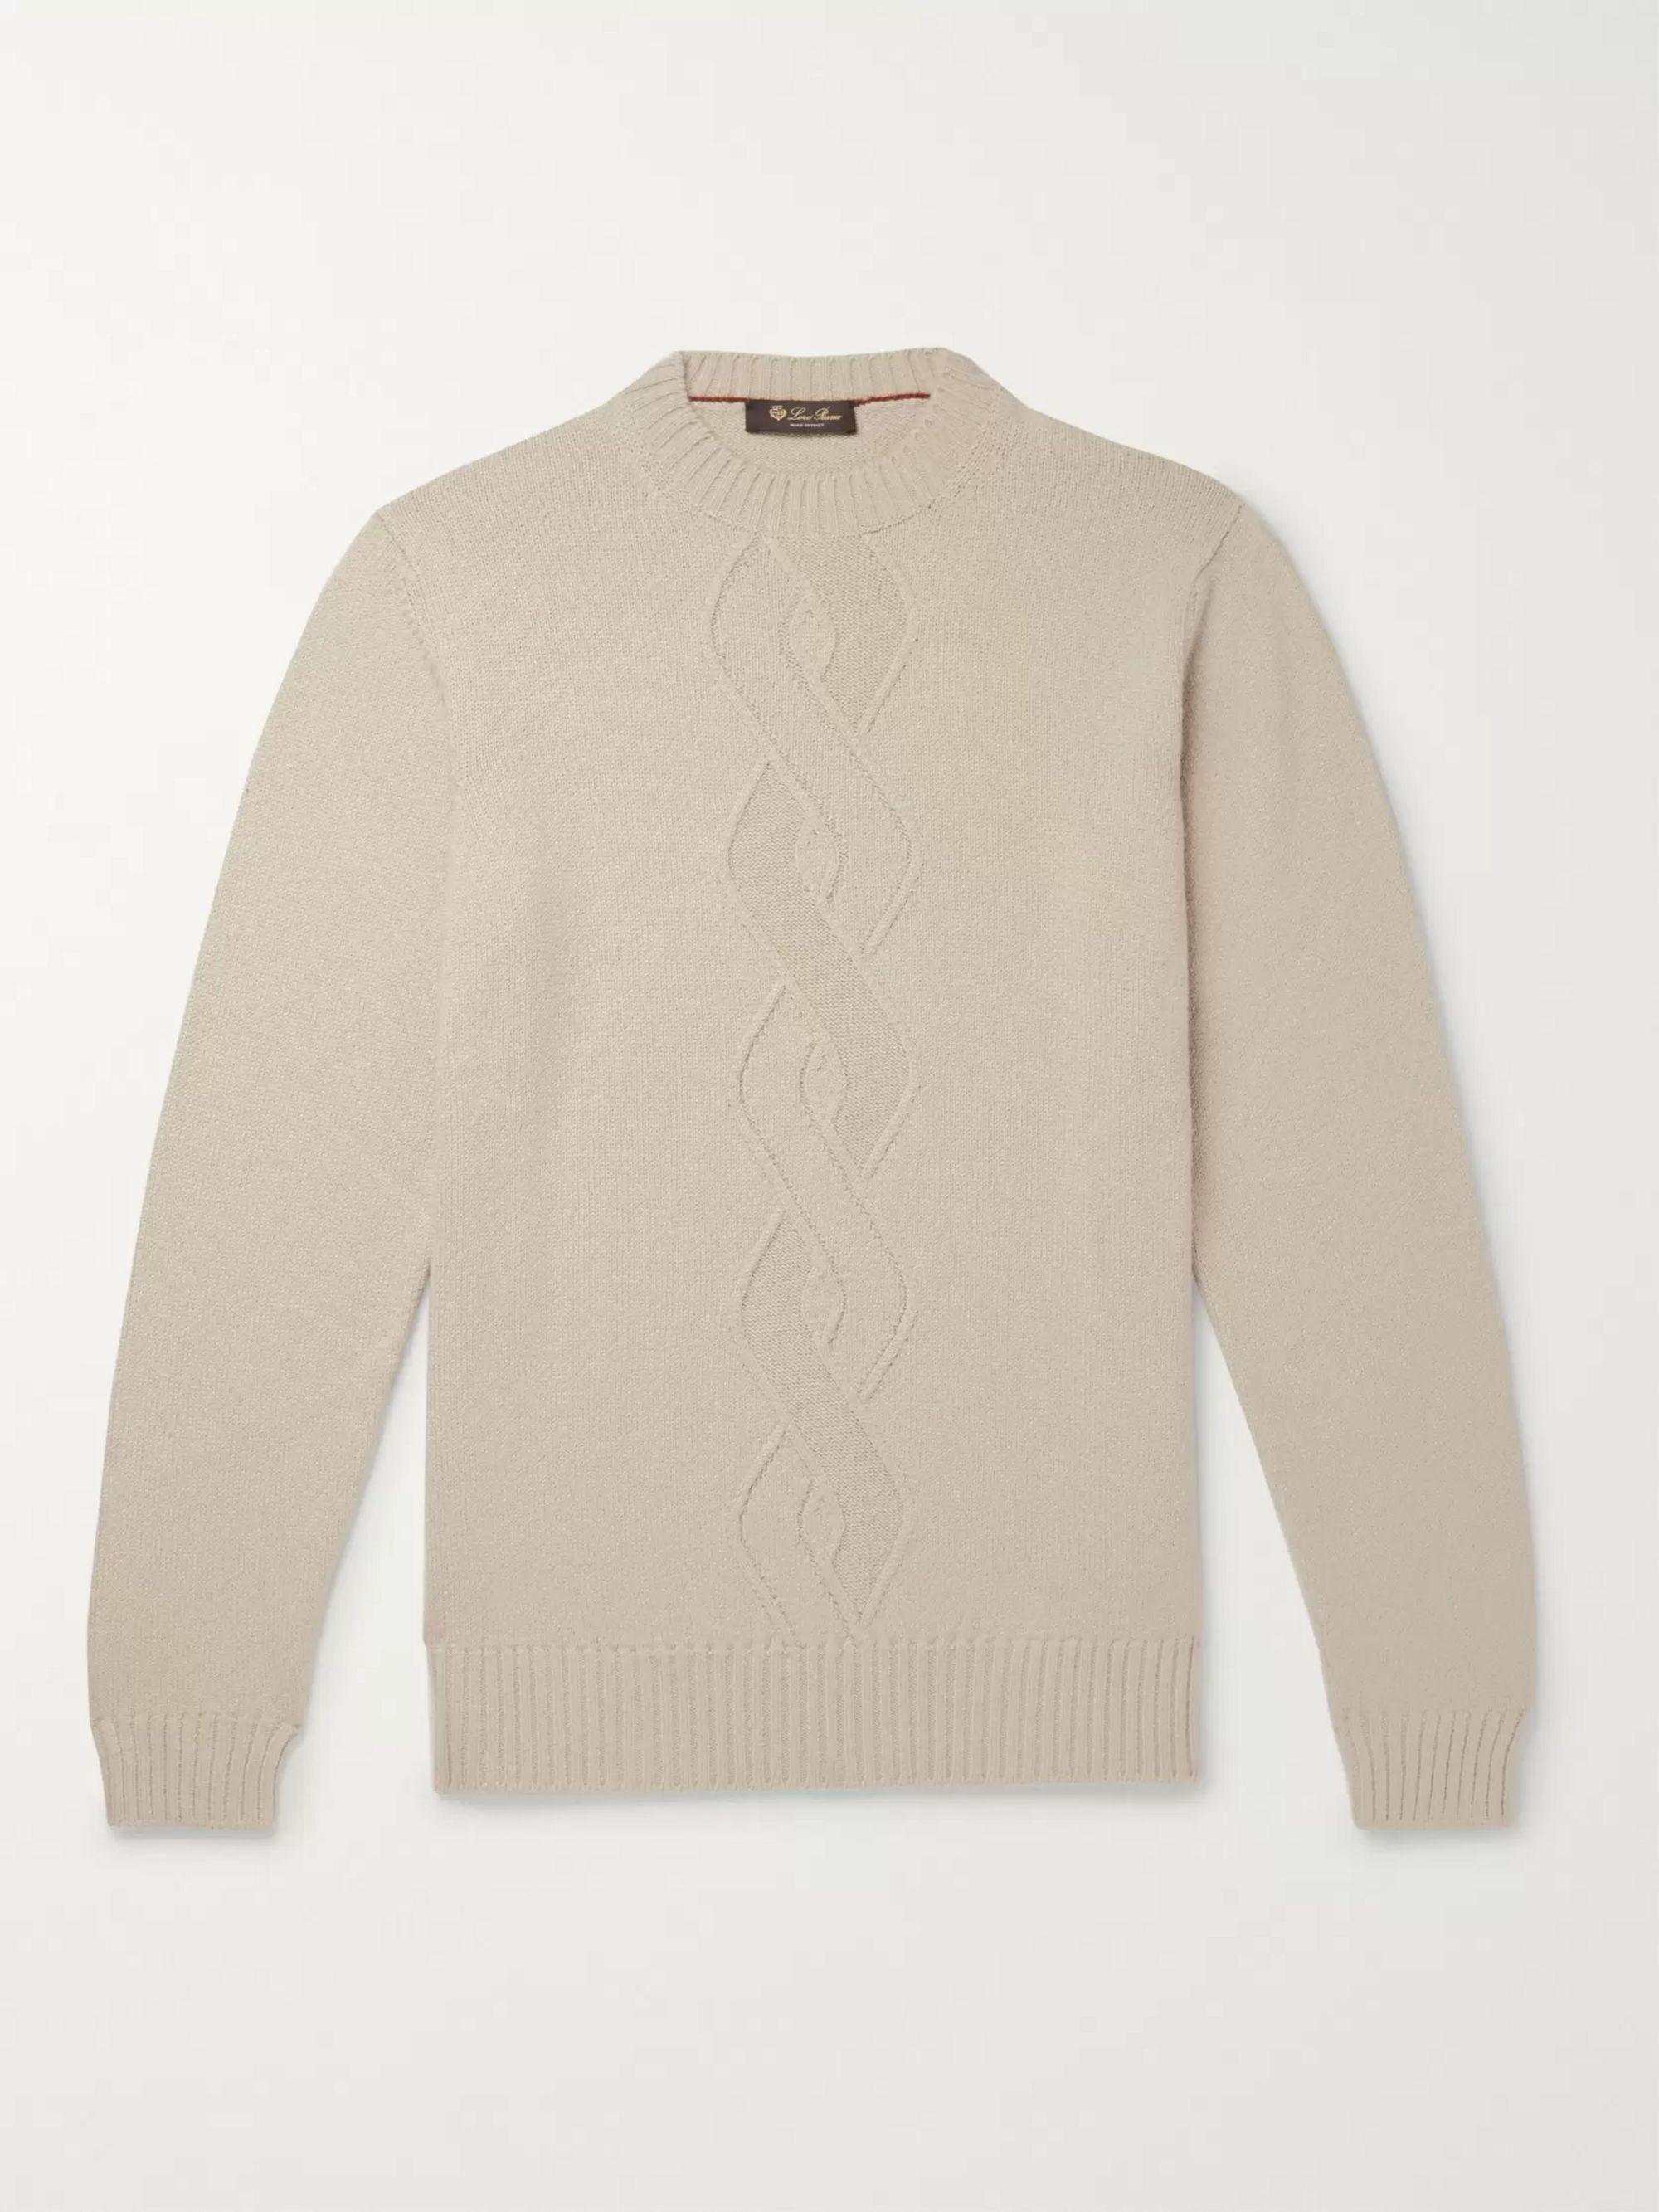 da44eb7296 Cable-Knit Cashmere, Silk and Cotton-Blend Sweater